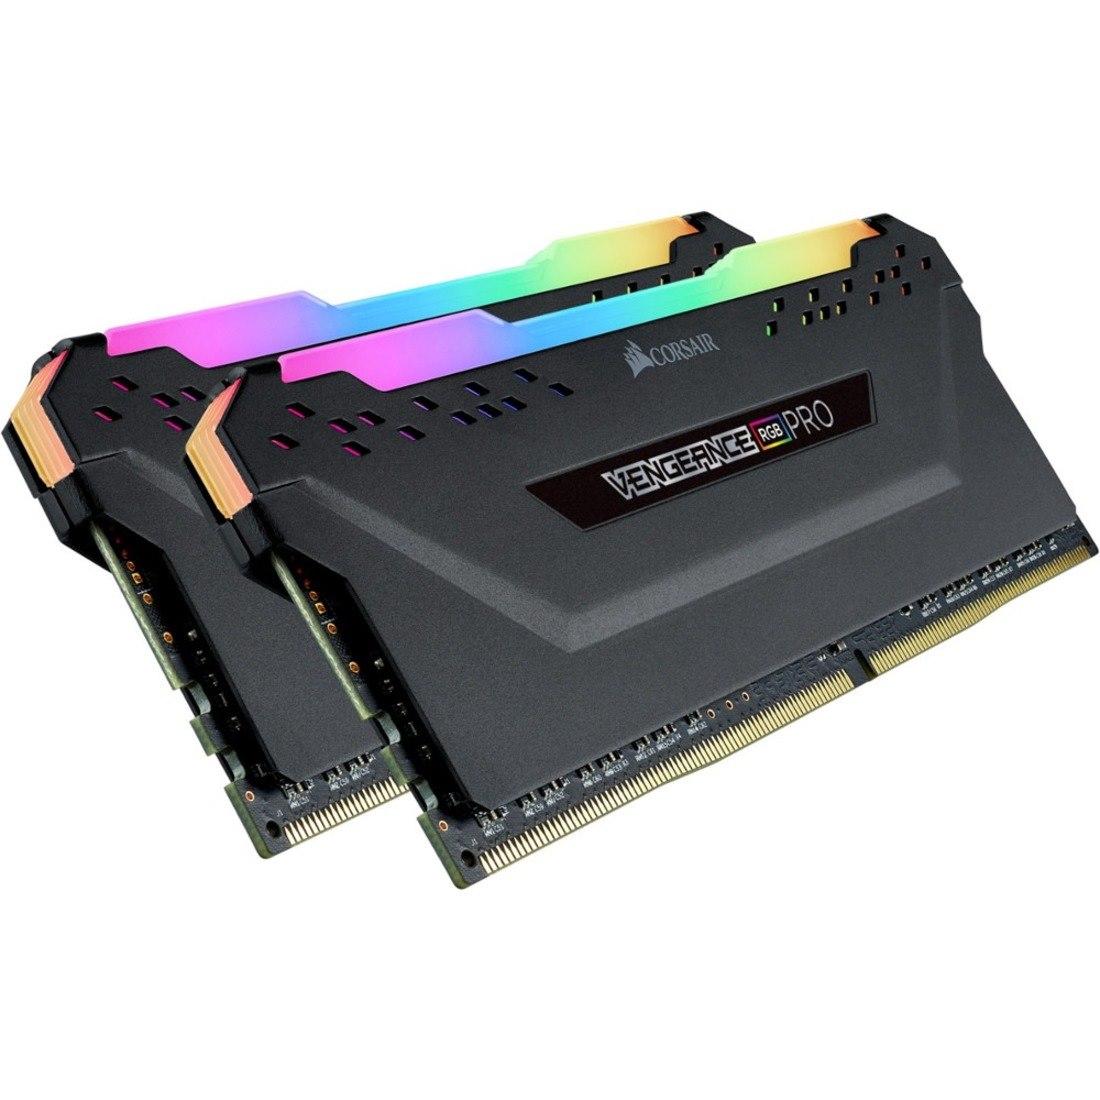 Corsair Vengeance RGB Pro RAM Module for Desktop PC - 32 GB (2 x 16 GB) - DDR4-3200/PC4-25600 DDR4 SDRAM - CL16 - 1.35 V